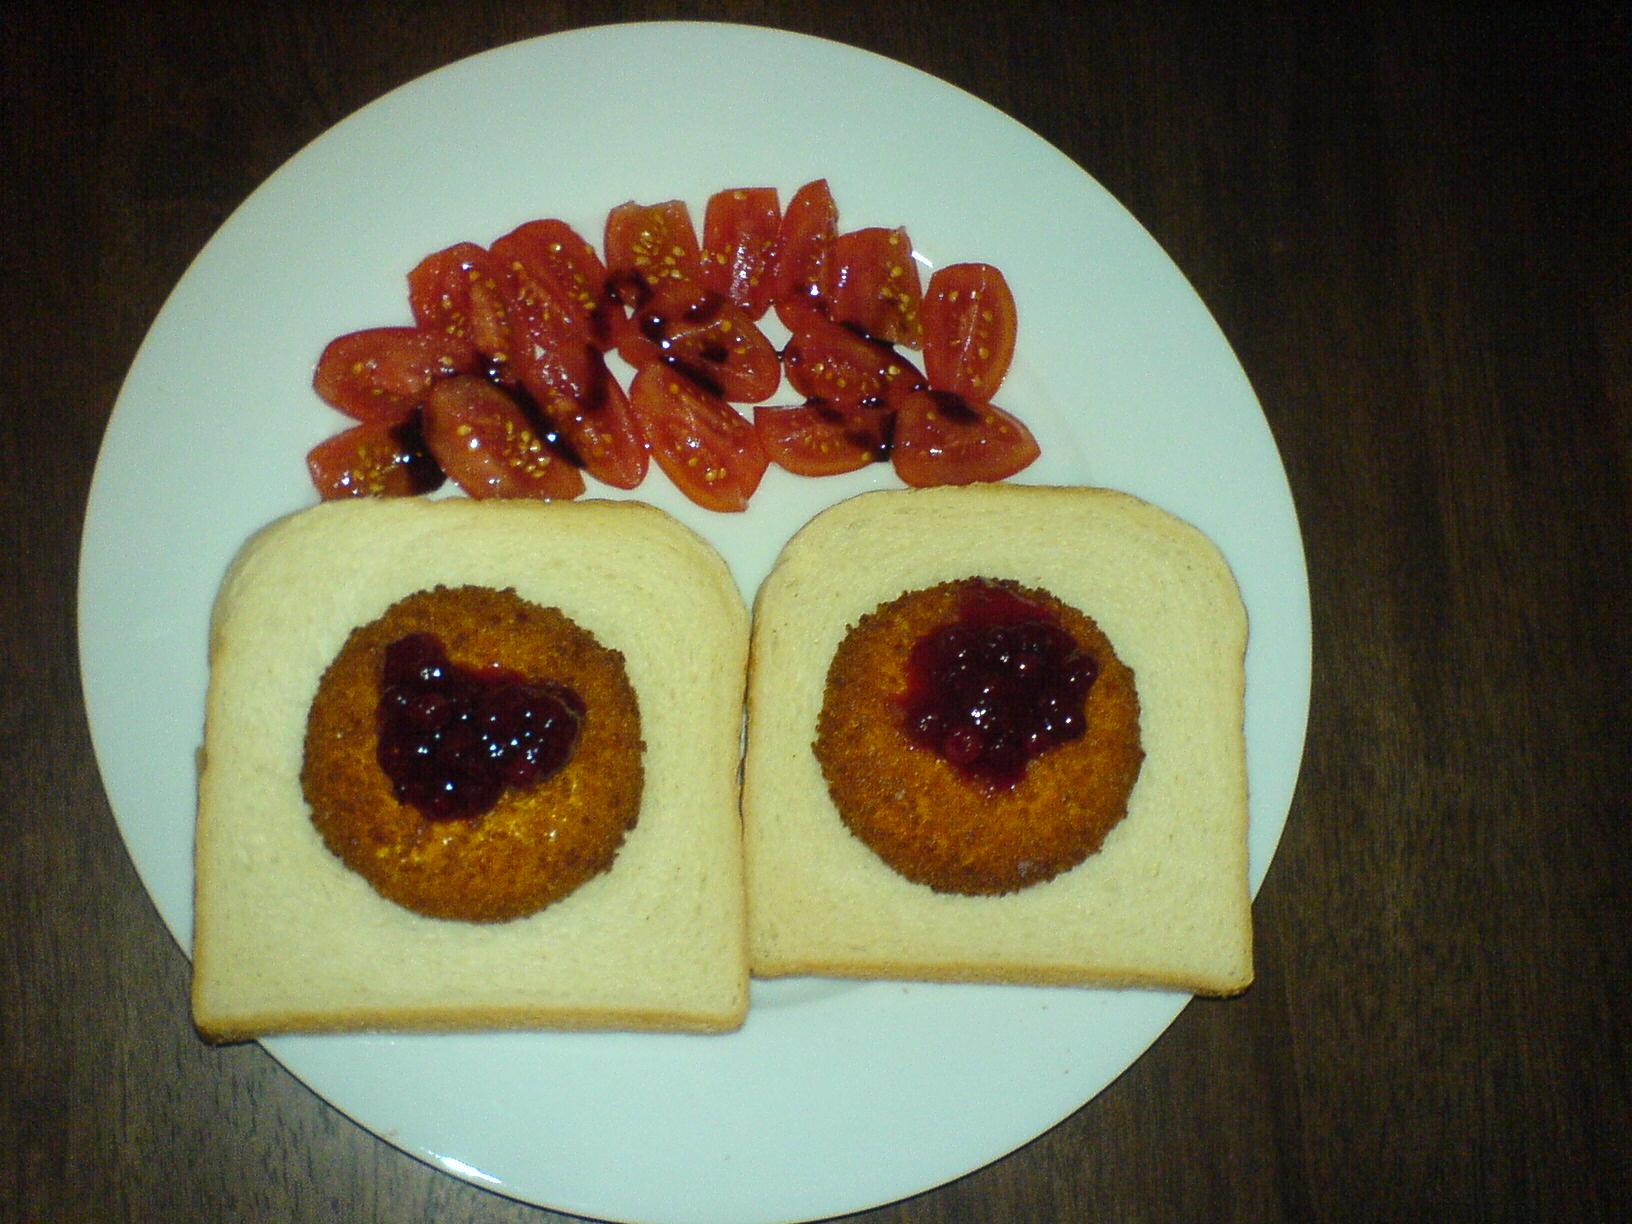 http://foodloader.net/Holz_2010-11-16_gebackener_Camembert_auf_Toasts_mit_Tomaten.jpg